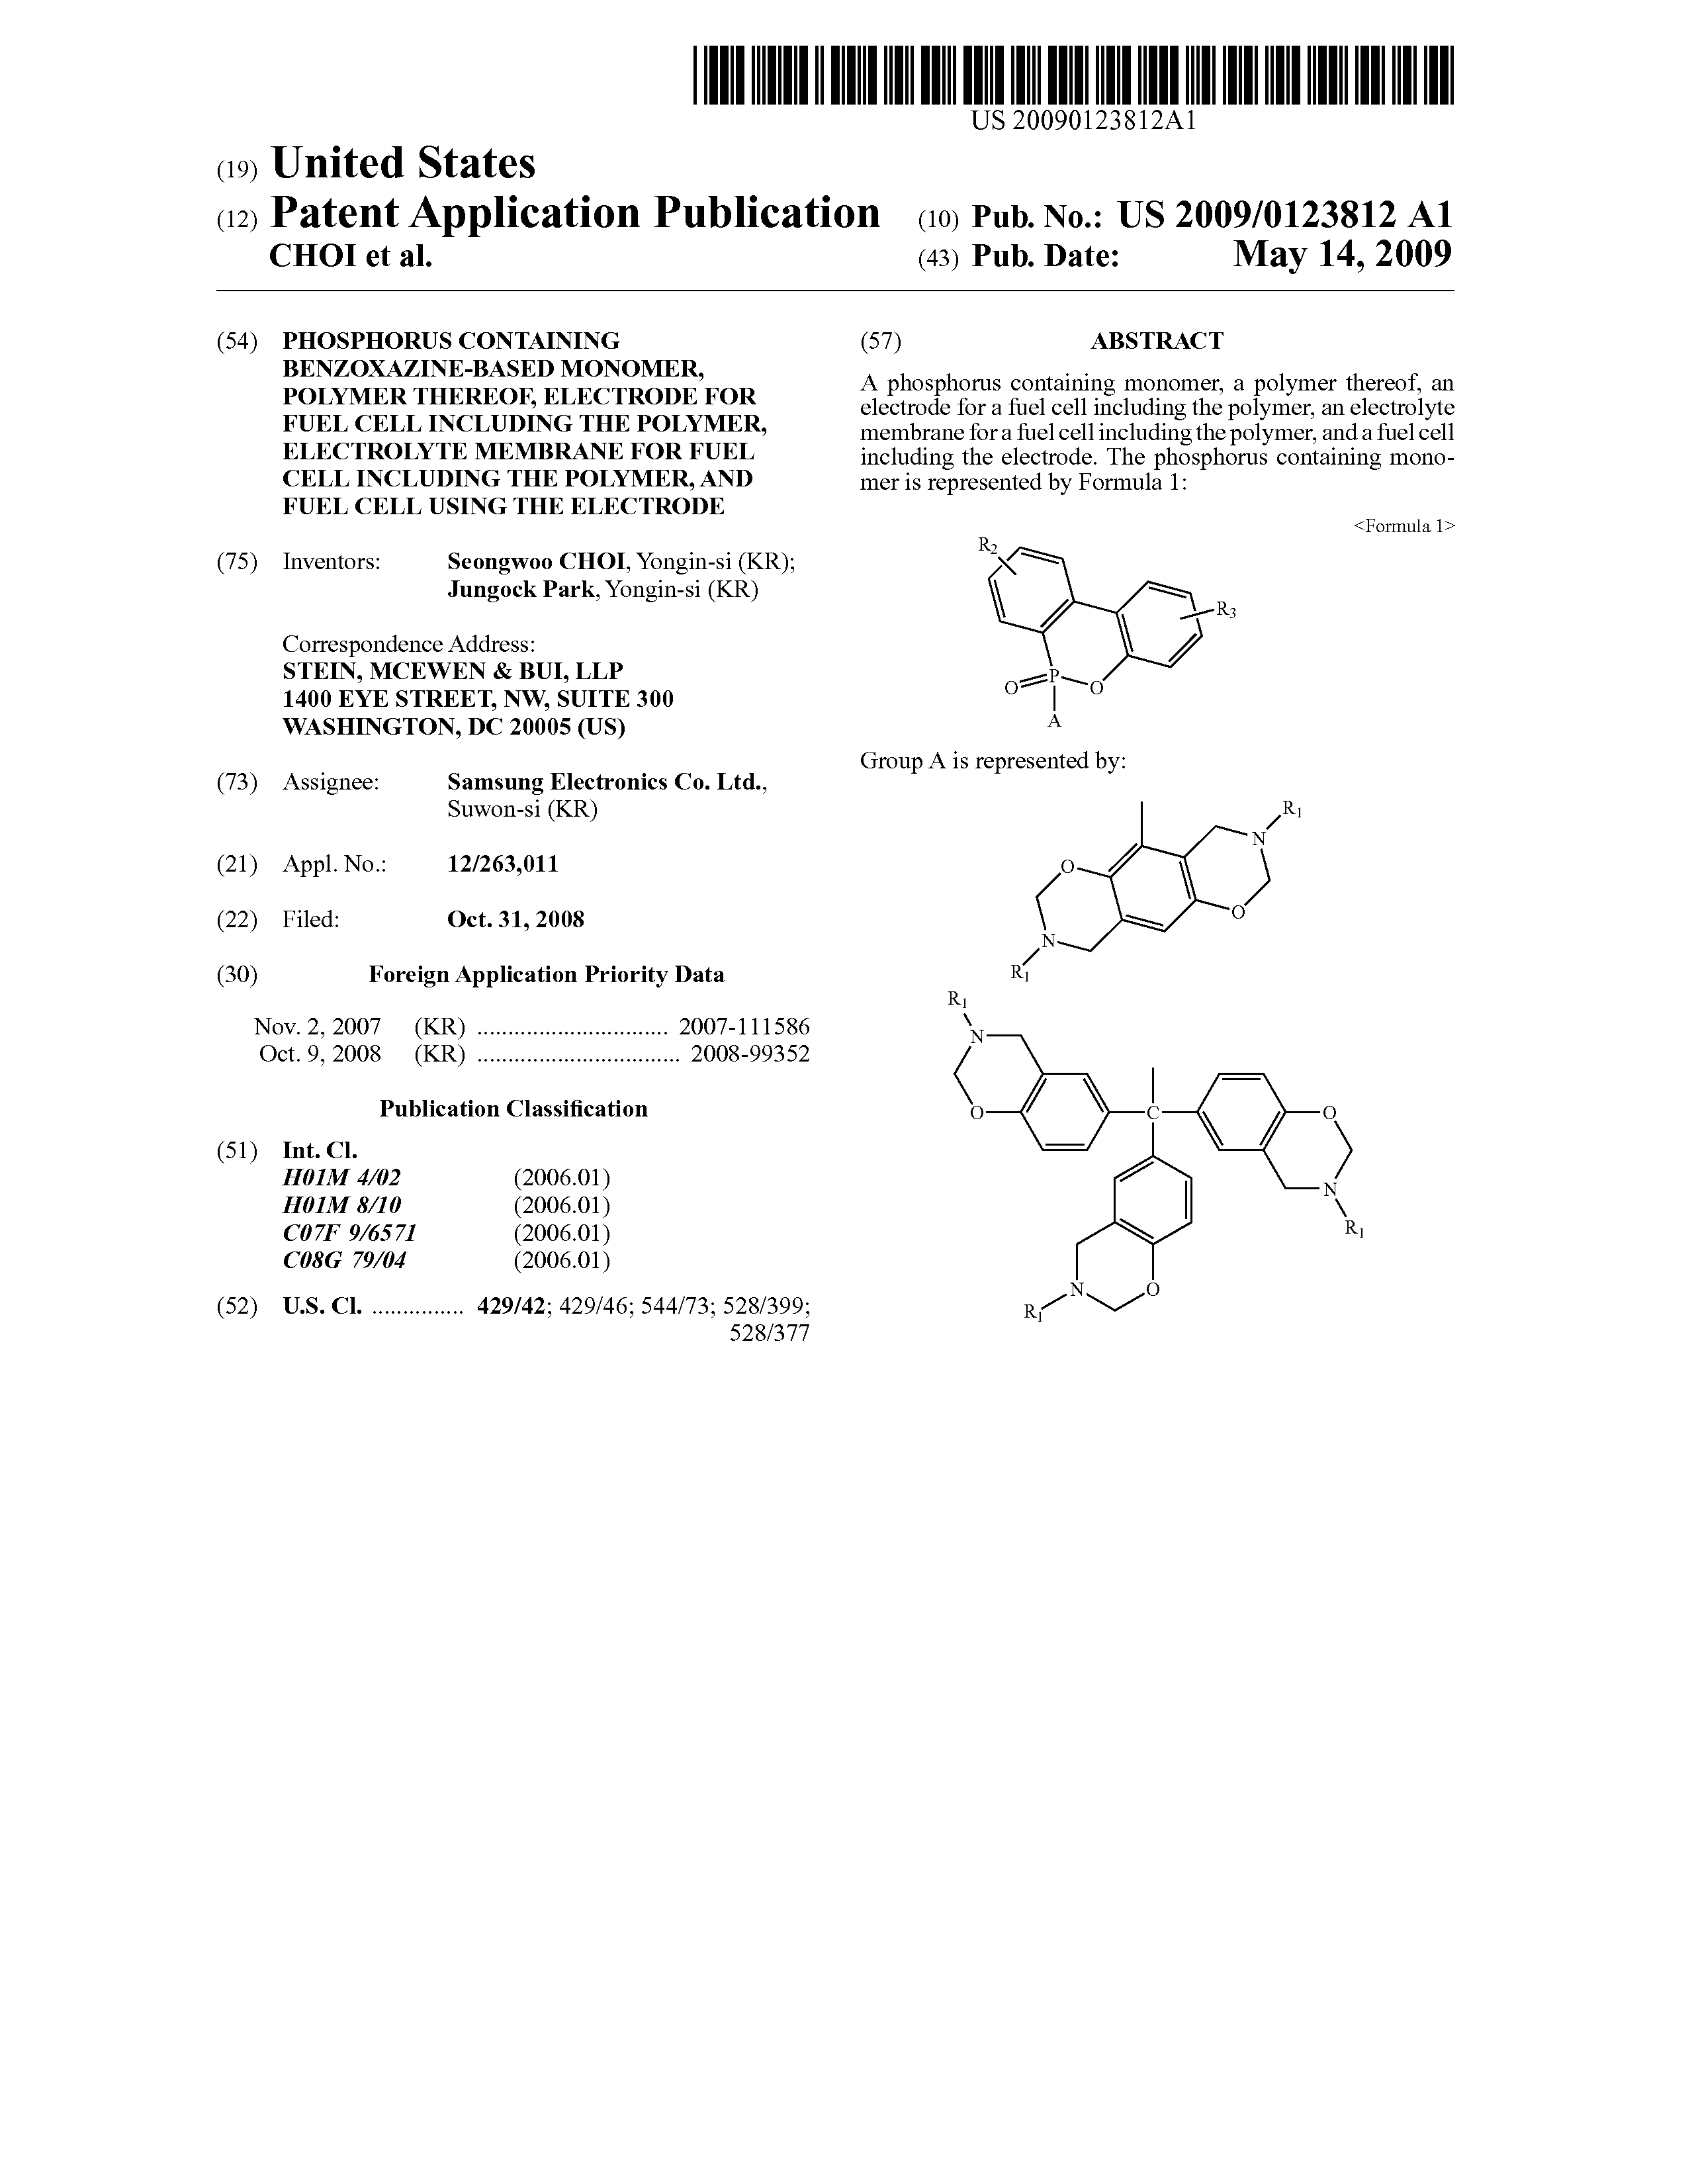 US 2009/0123812 A1 - Phosphorus Containing Benzoxazine-based Monomer